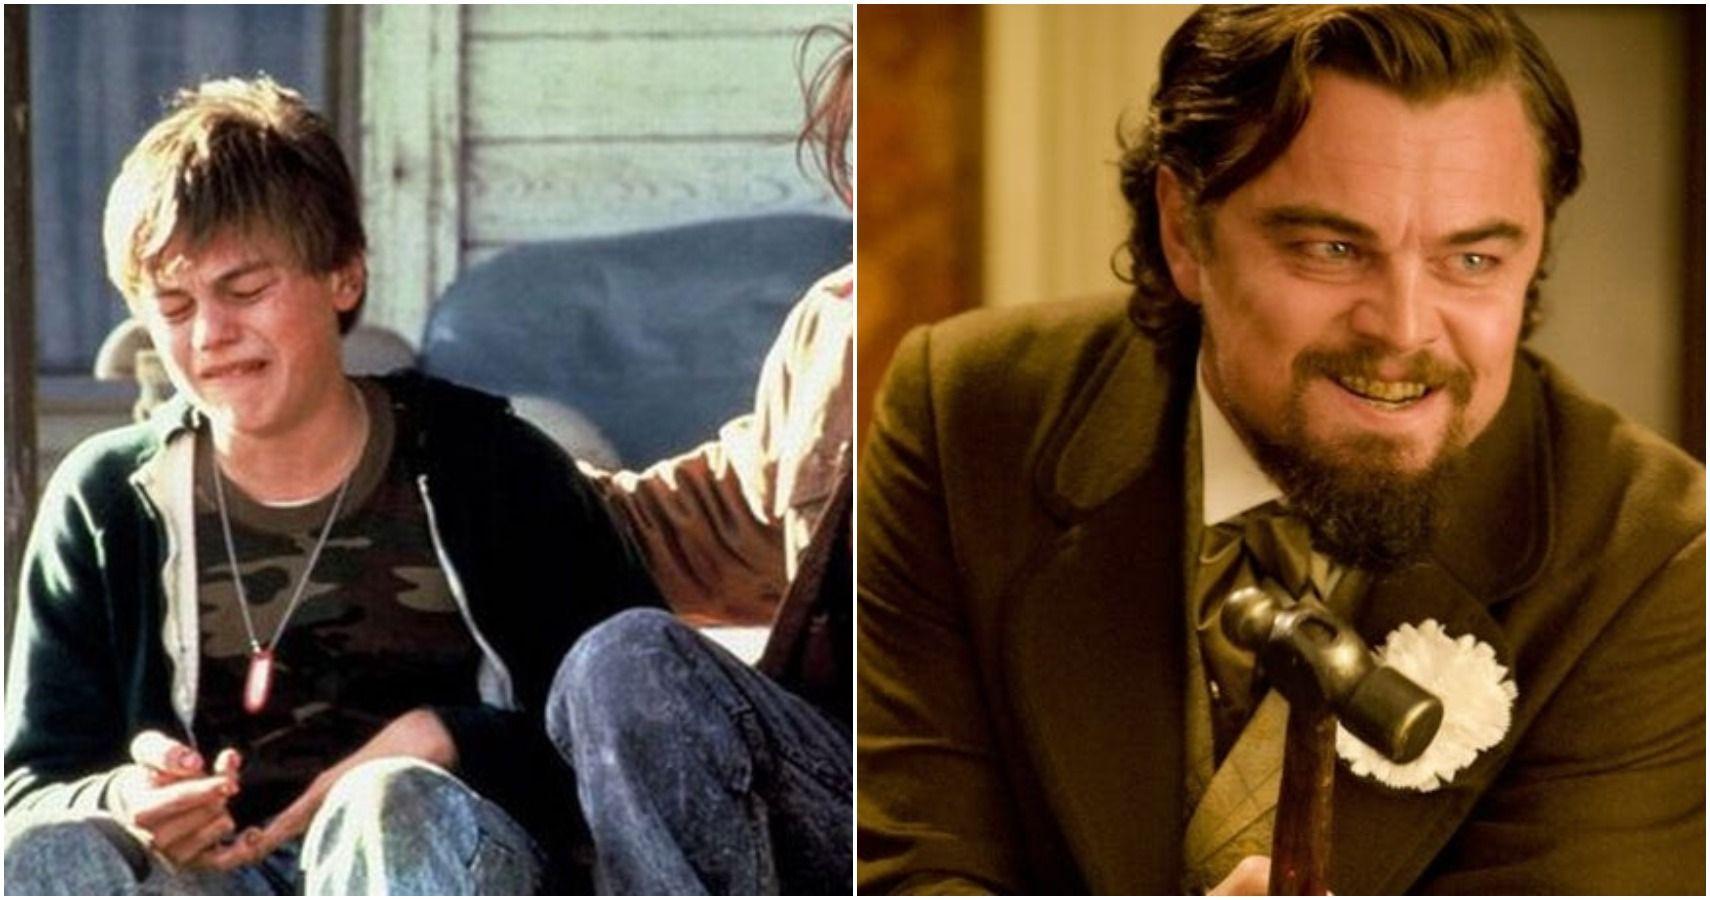 Leonardo DiCaprio's 10 Best Movies (According to IMDB)